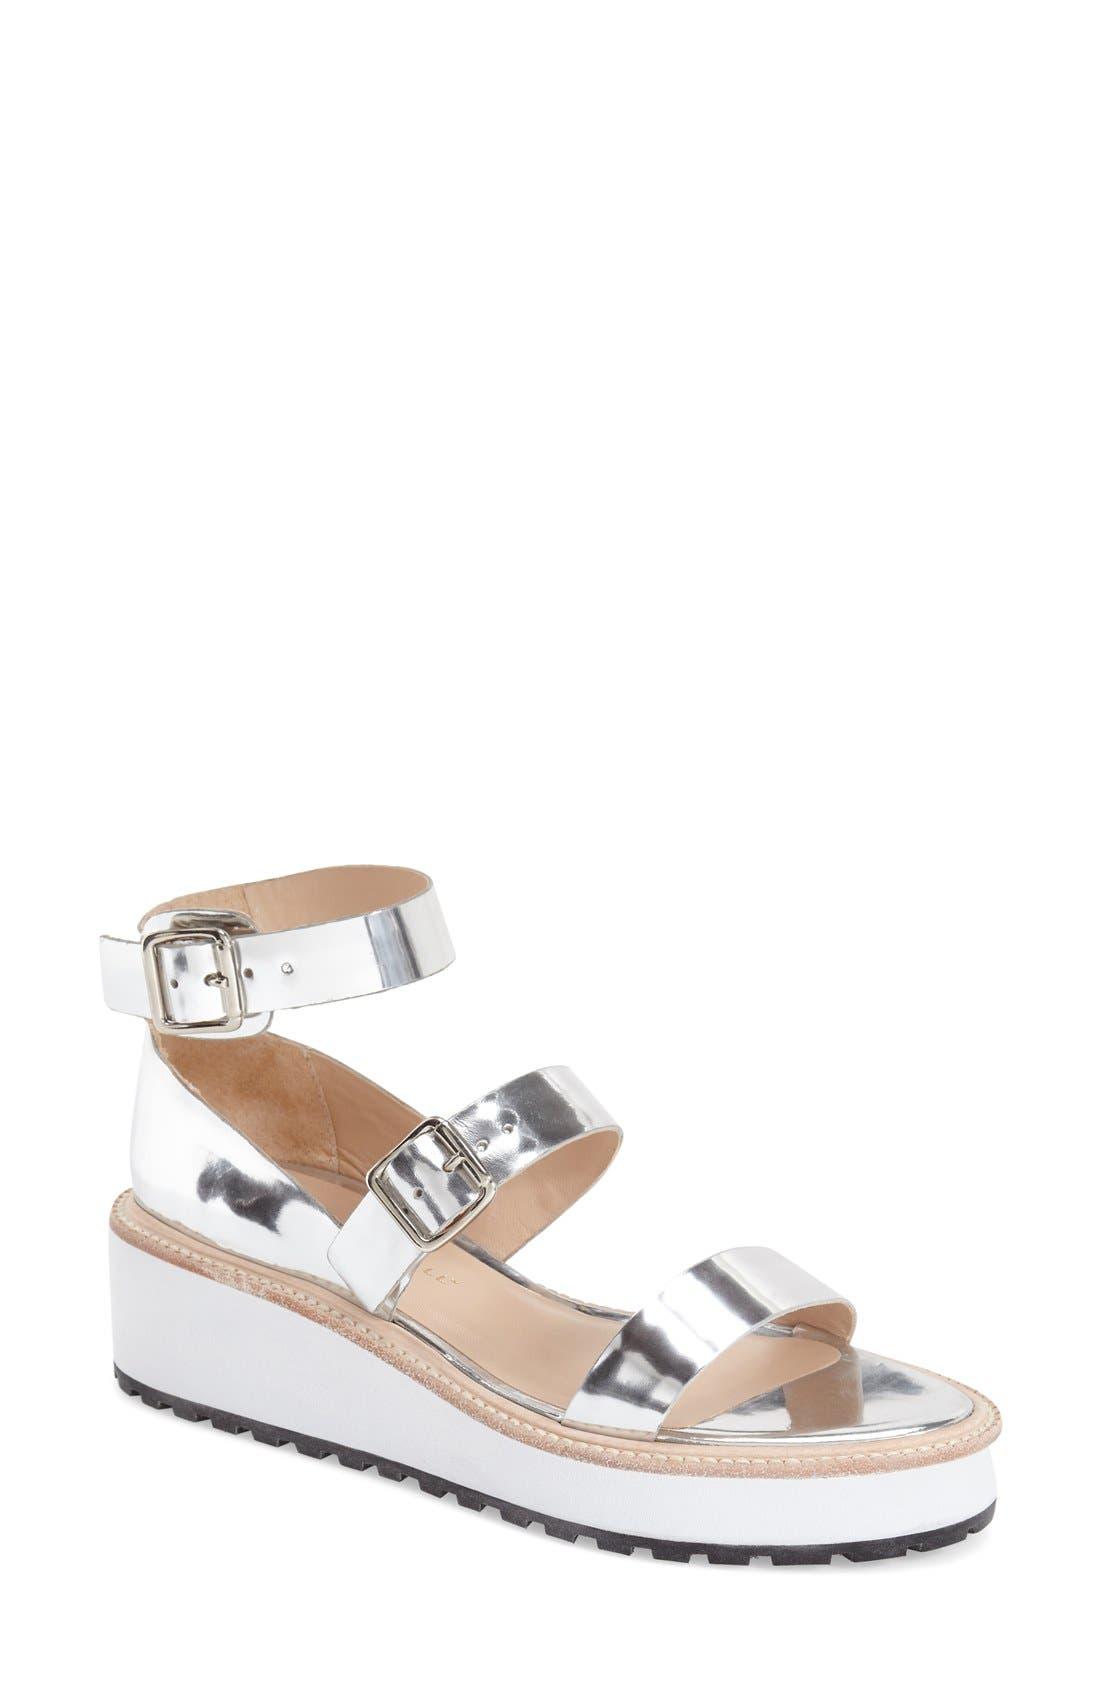 Main Image - Loeffler Randall 'Pia' Platform Wedge Sandal (Women)